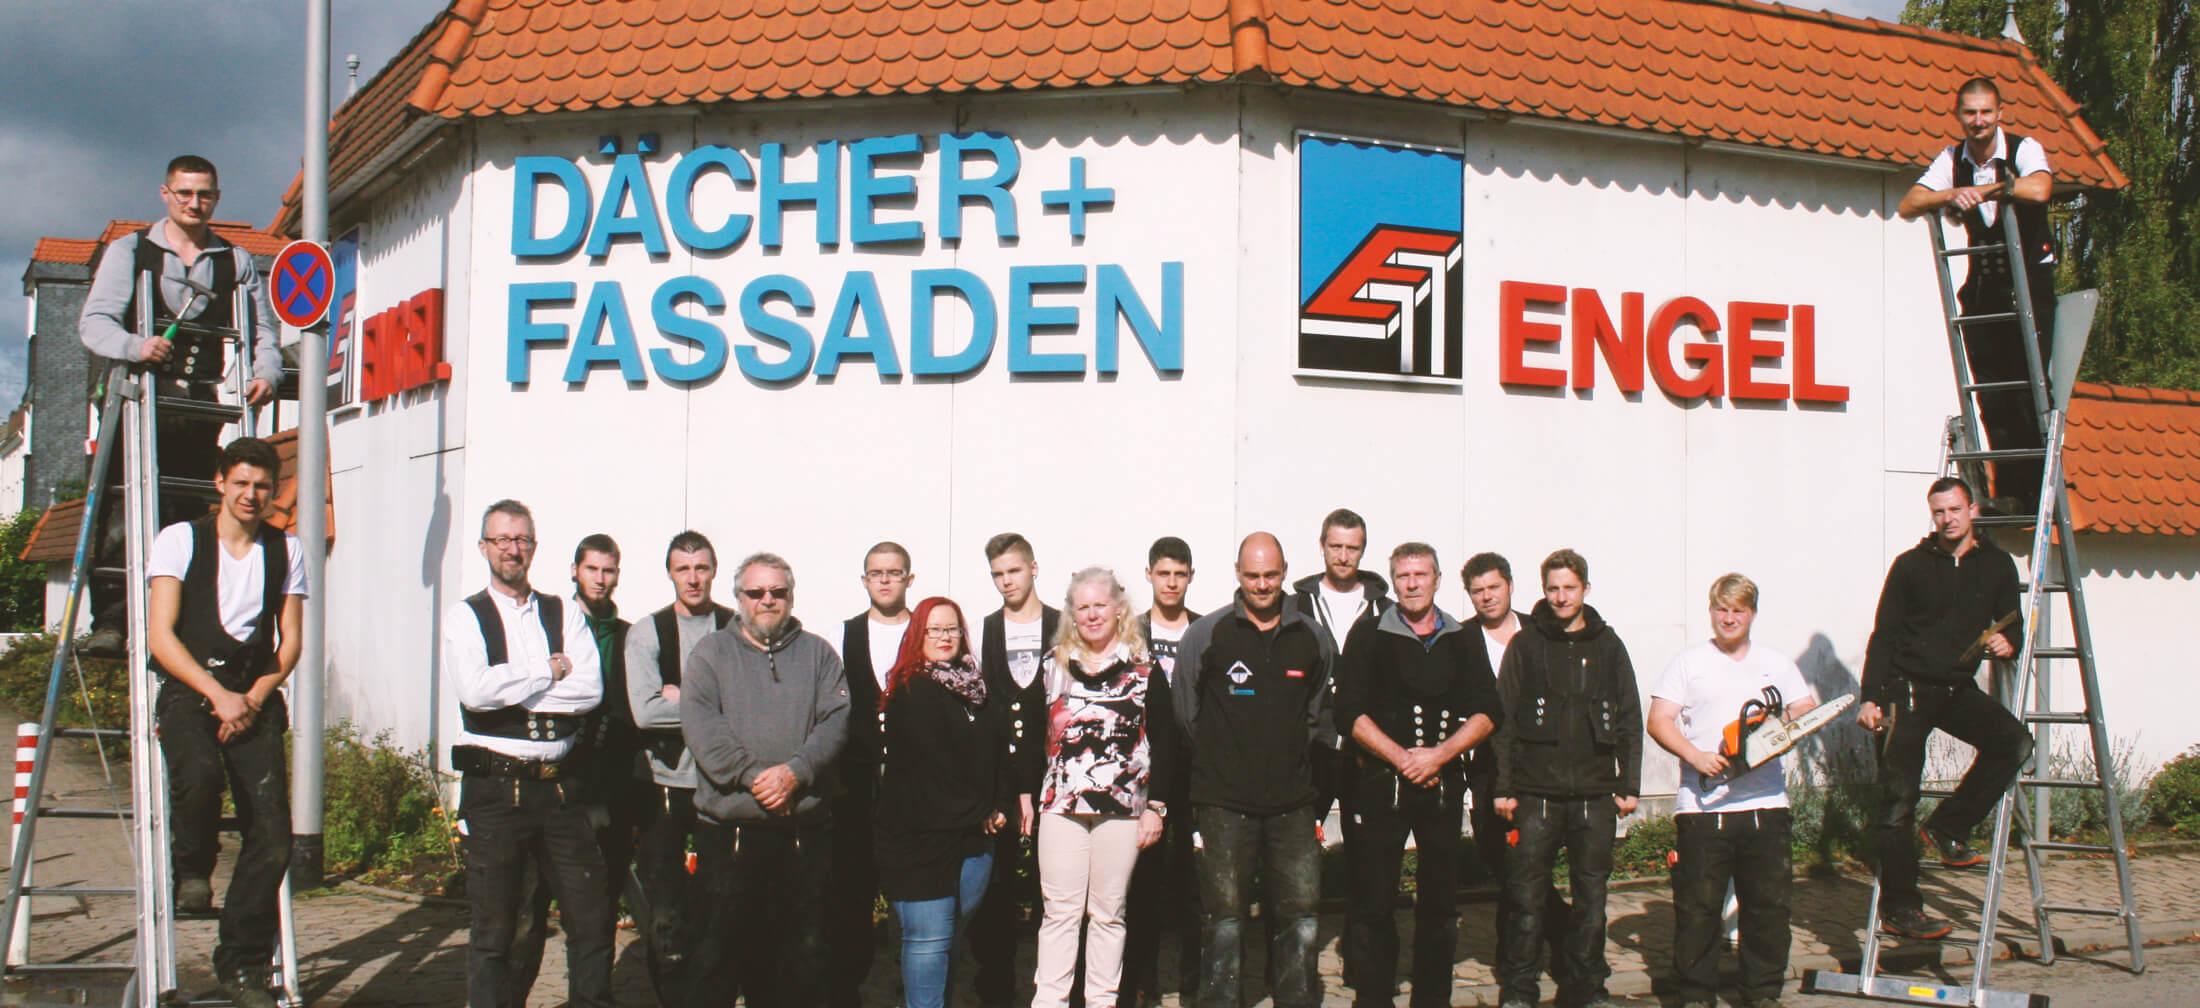 Dachdeckerteam Engel Saarbrücken